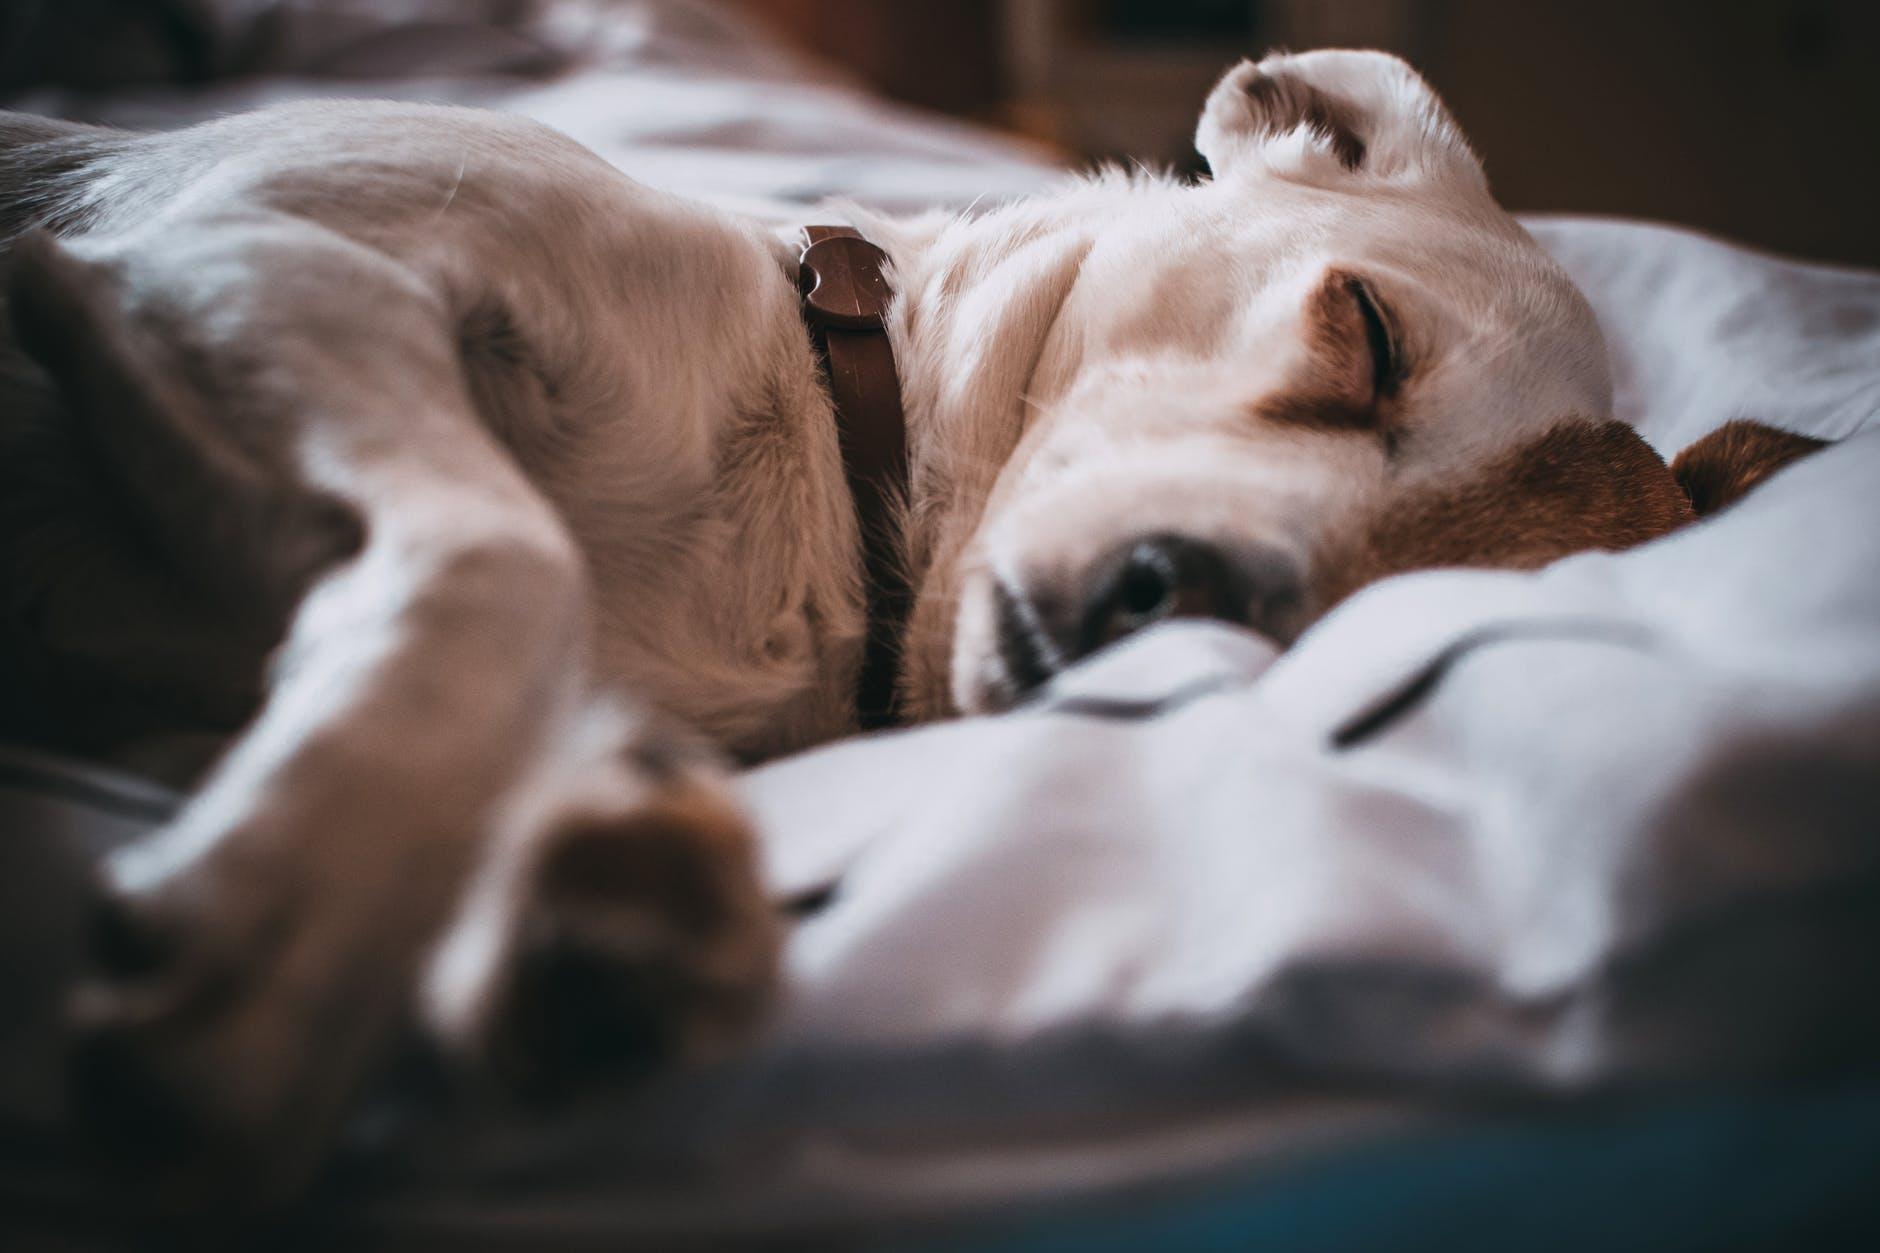 close up photography of sleeping dog